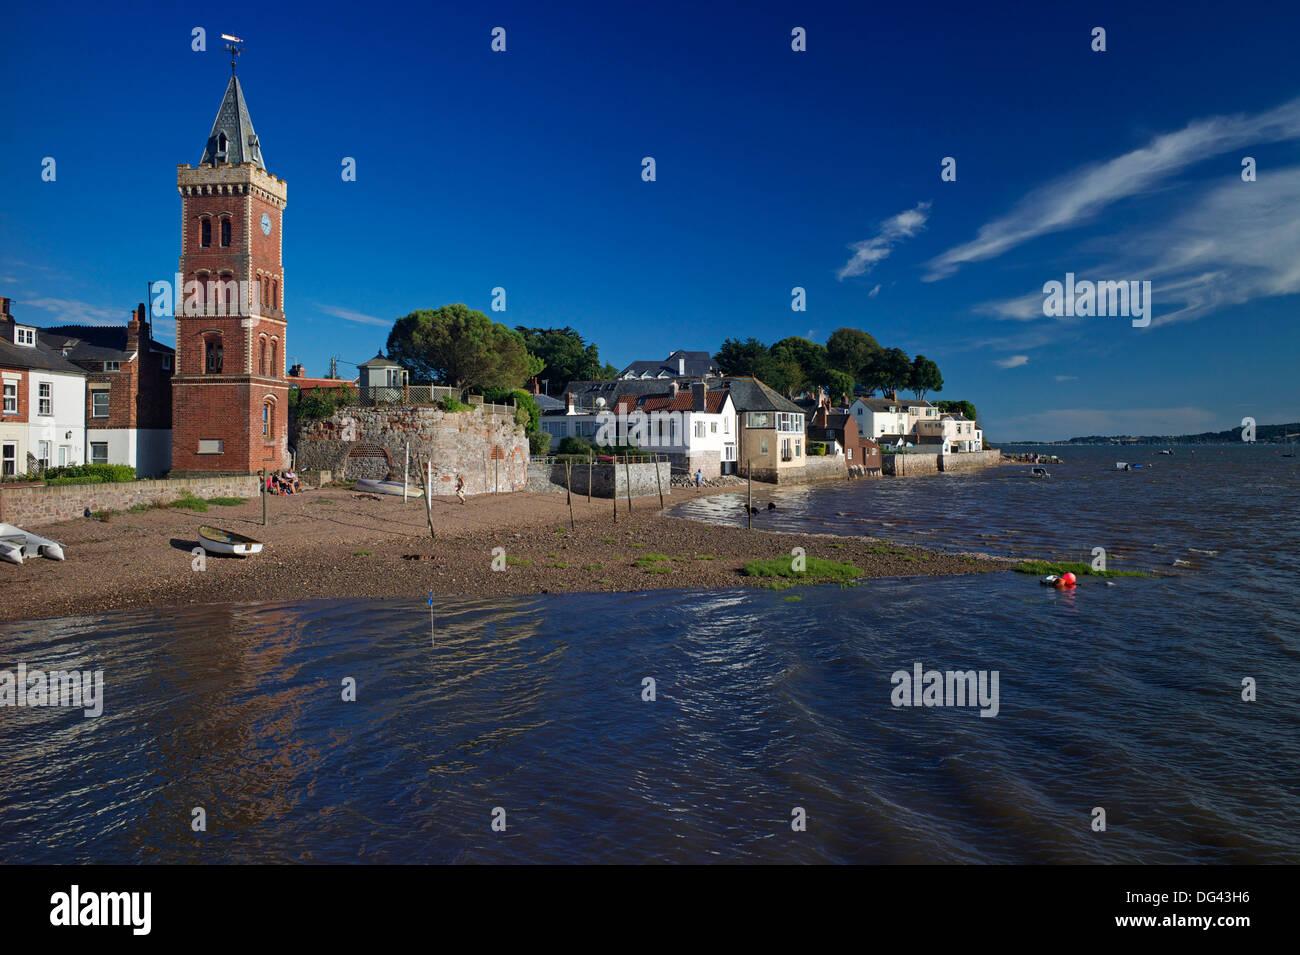 Peters Tower, the harbour, Lympstone, Exe Estuary, Devon, England, United Kingdom, Europe - Stock Image